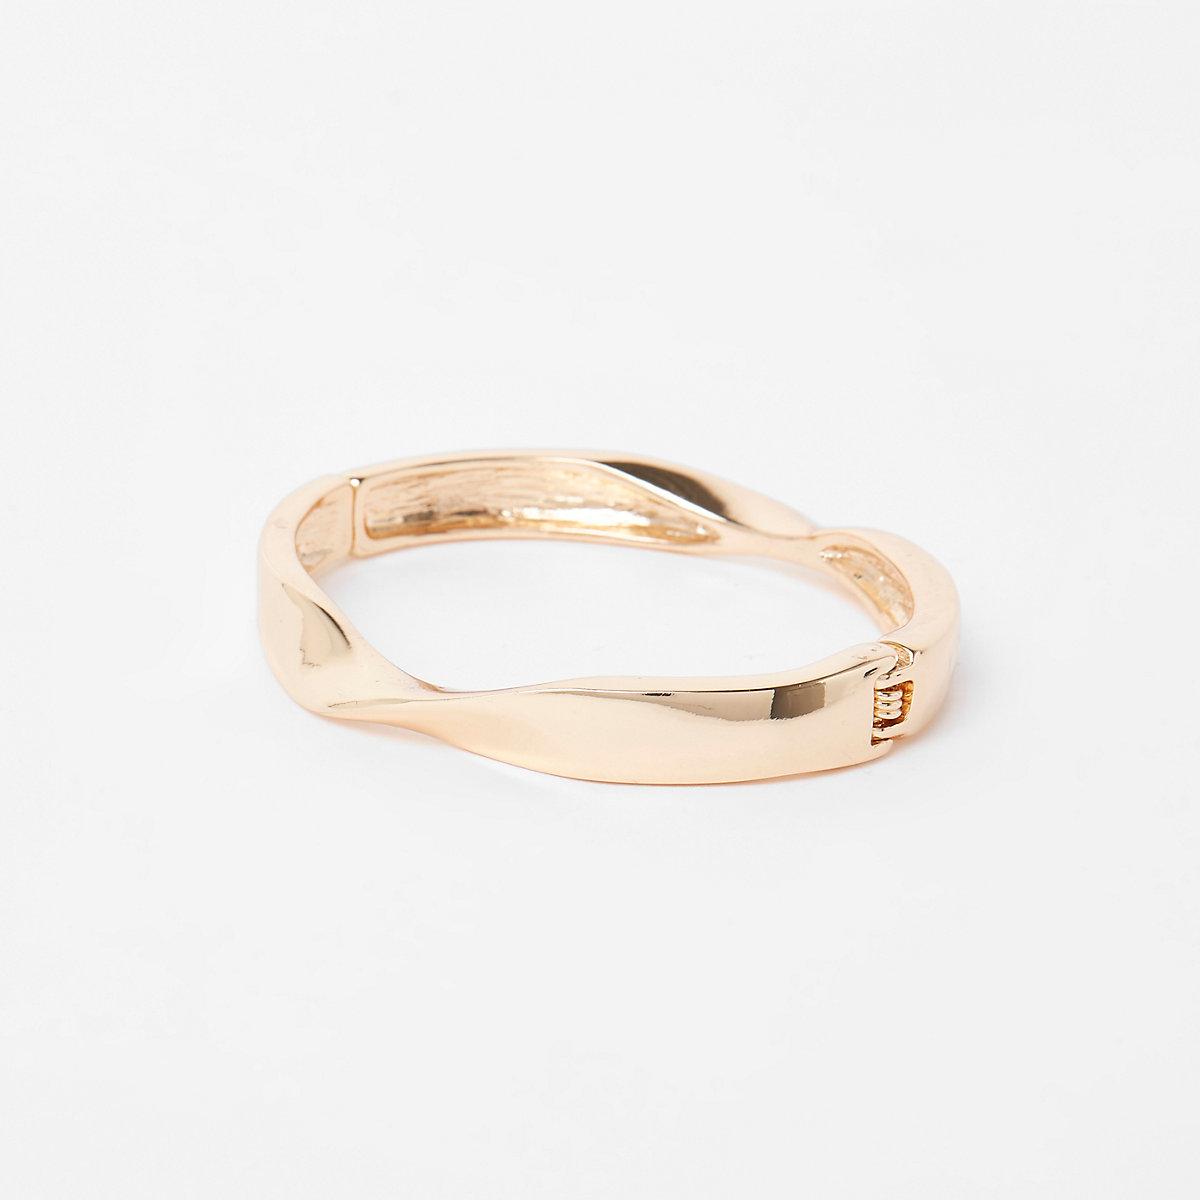 Gold color twist cuff bracelet